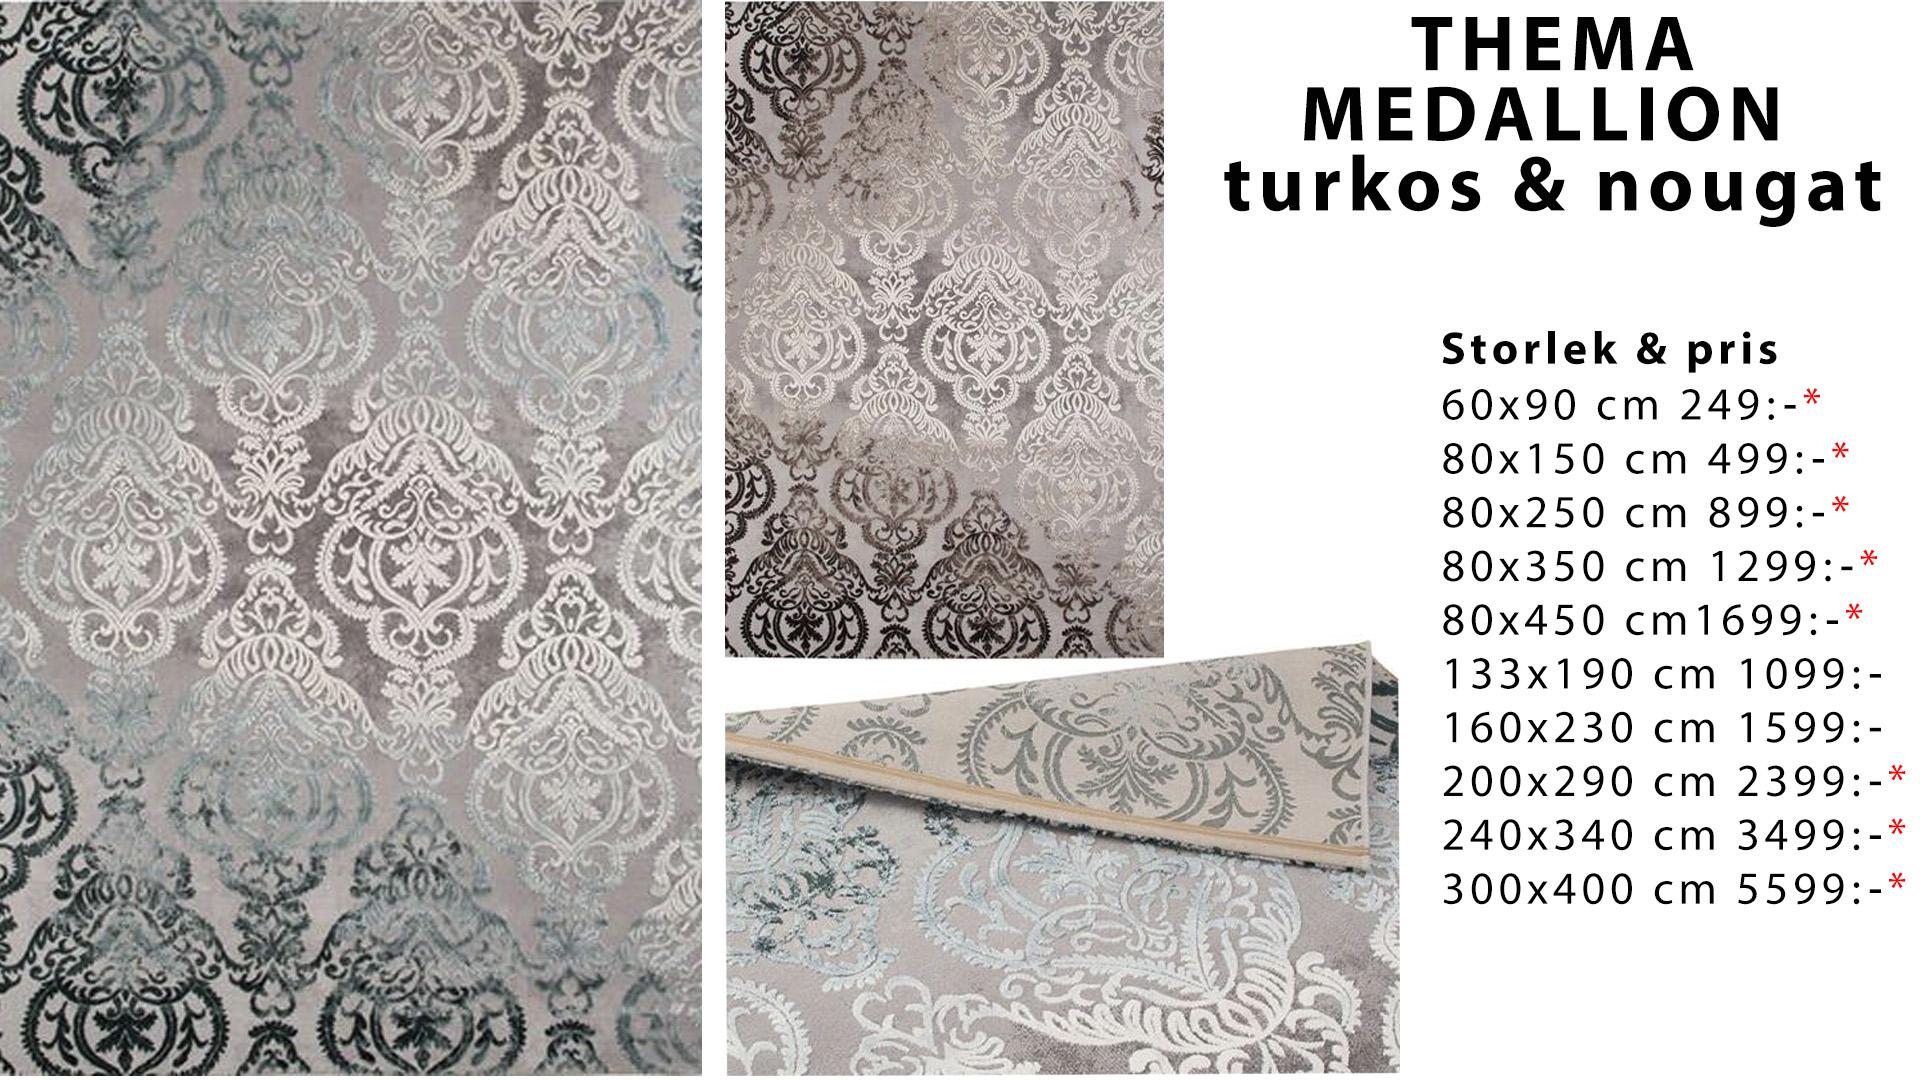 Thema madallion turkos och noughat matta